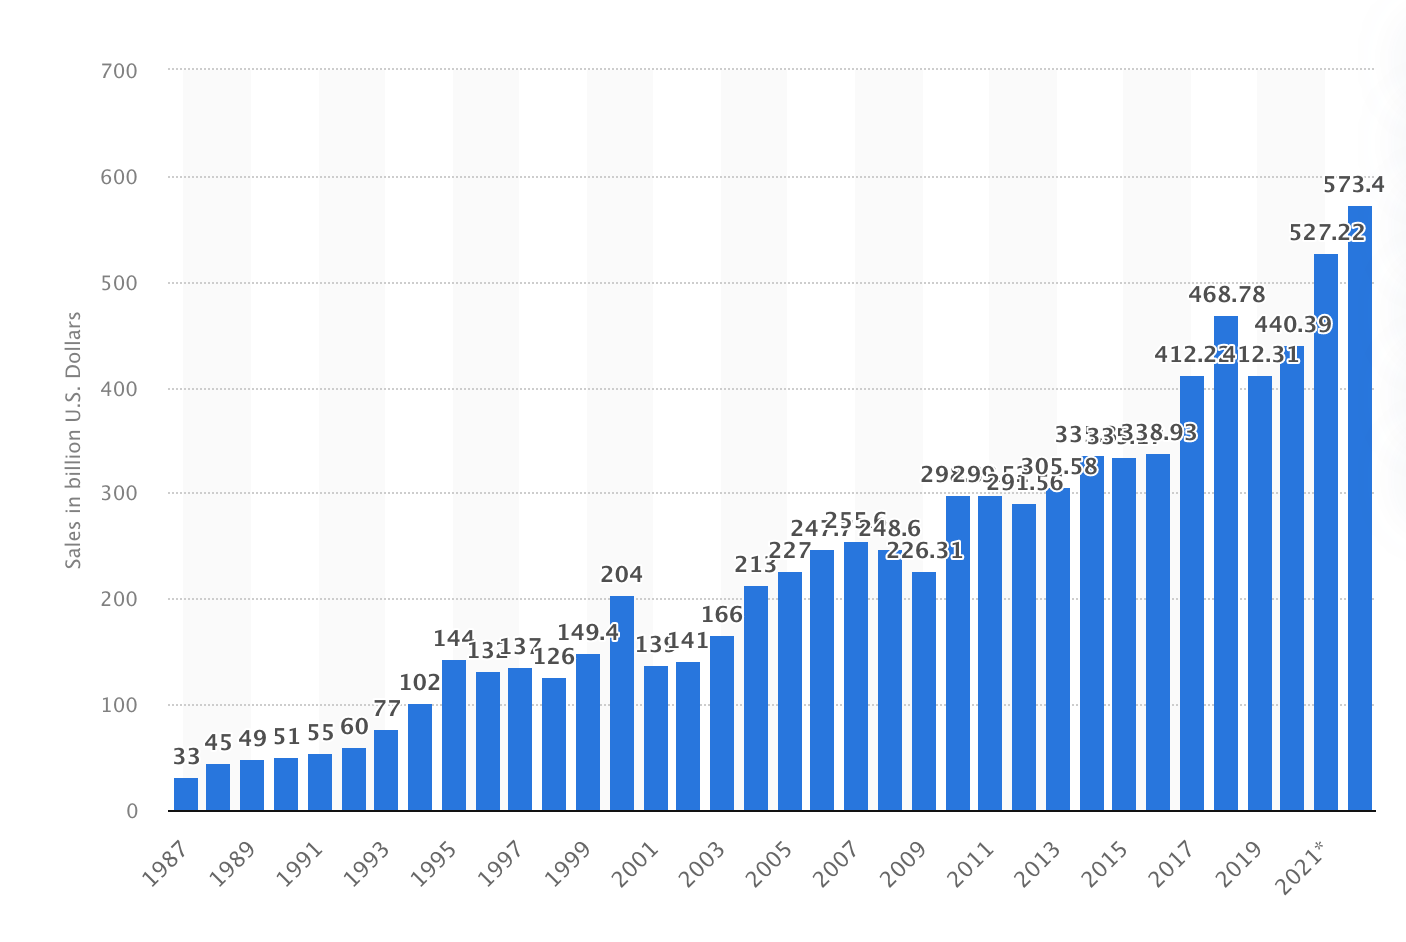 Line chart of Semiconductor market size worldwide